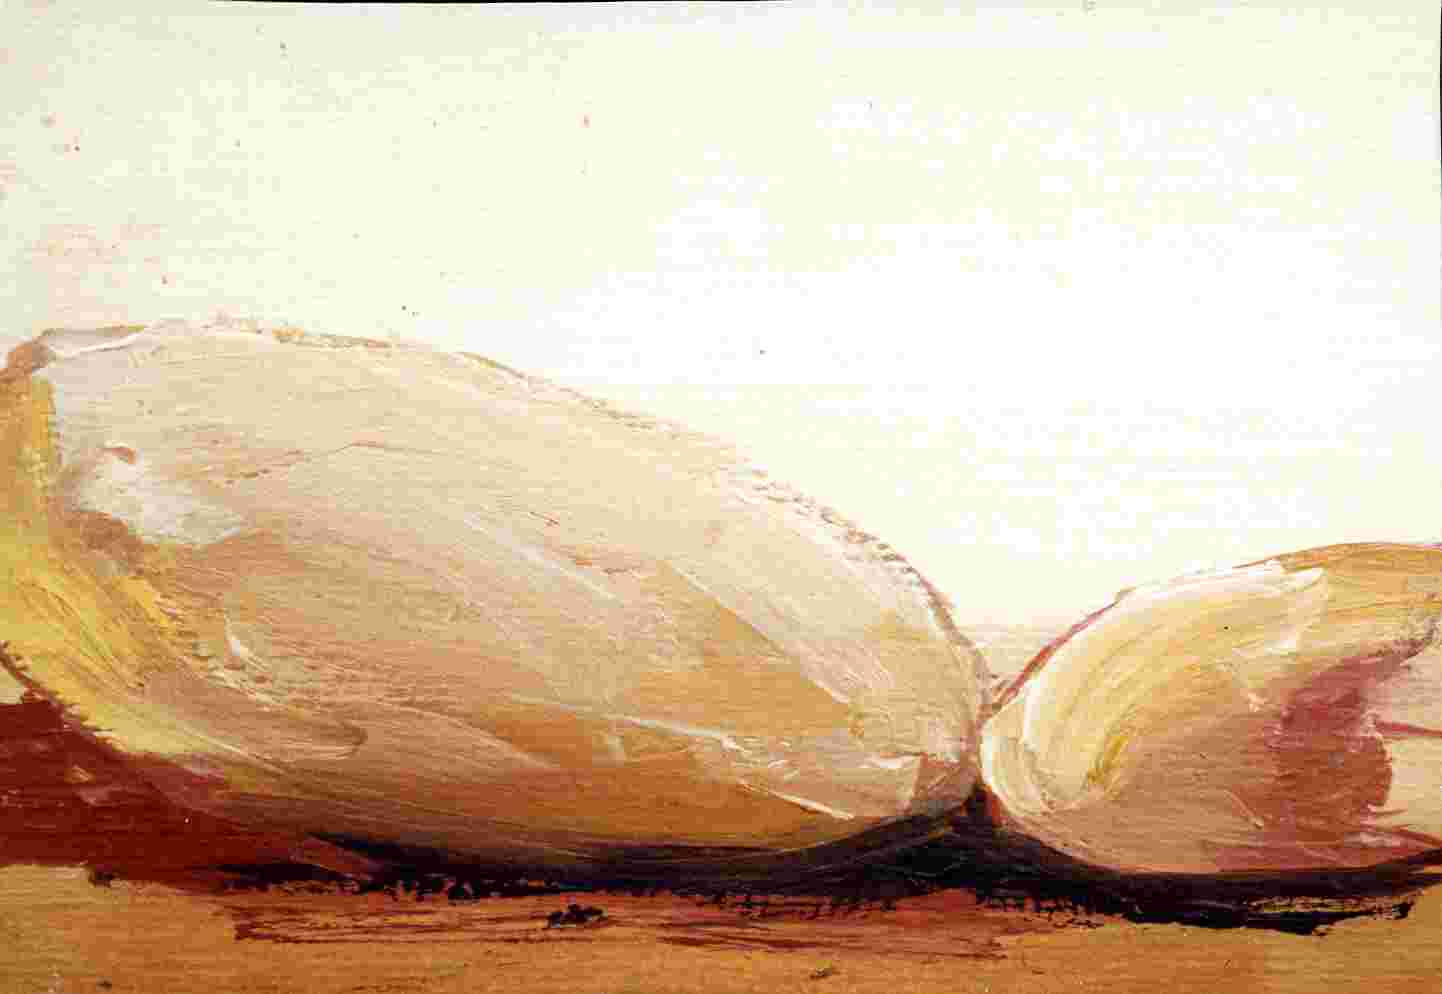 Frauenlandschaft, Öl auf Bütten, 10,5 cm x 14,5 cm , 1998